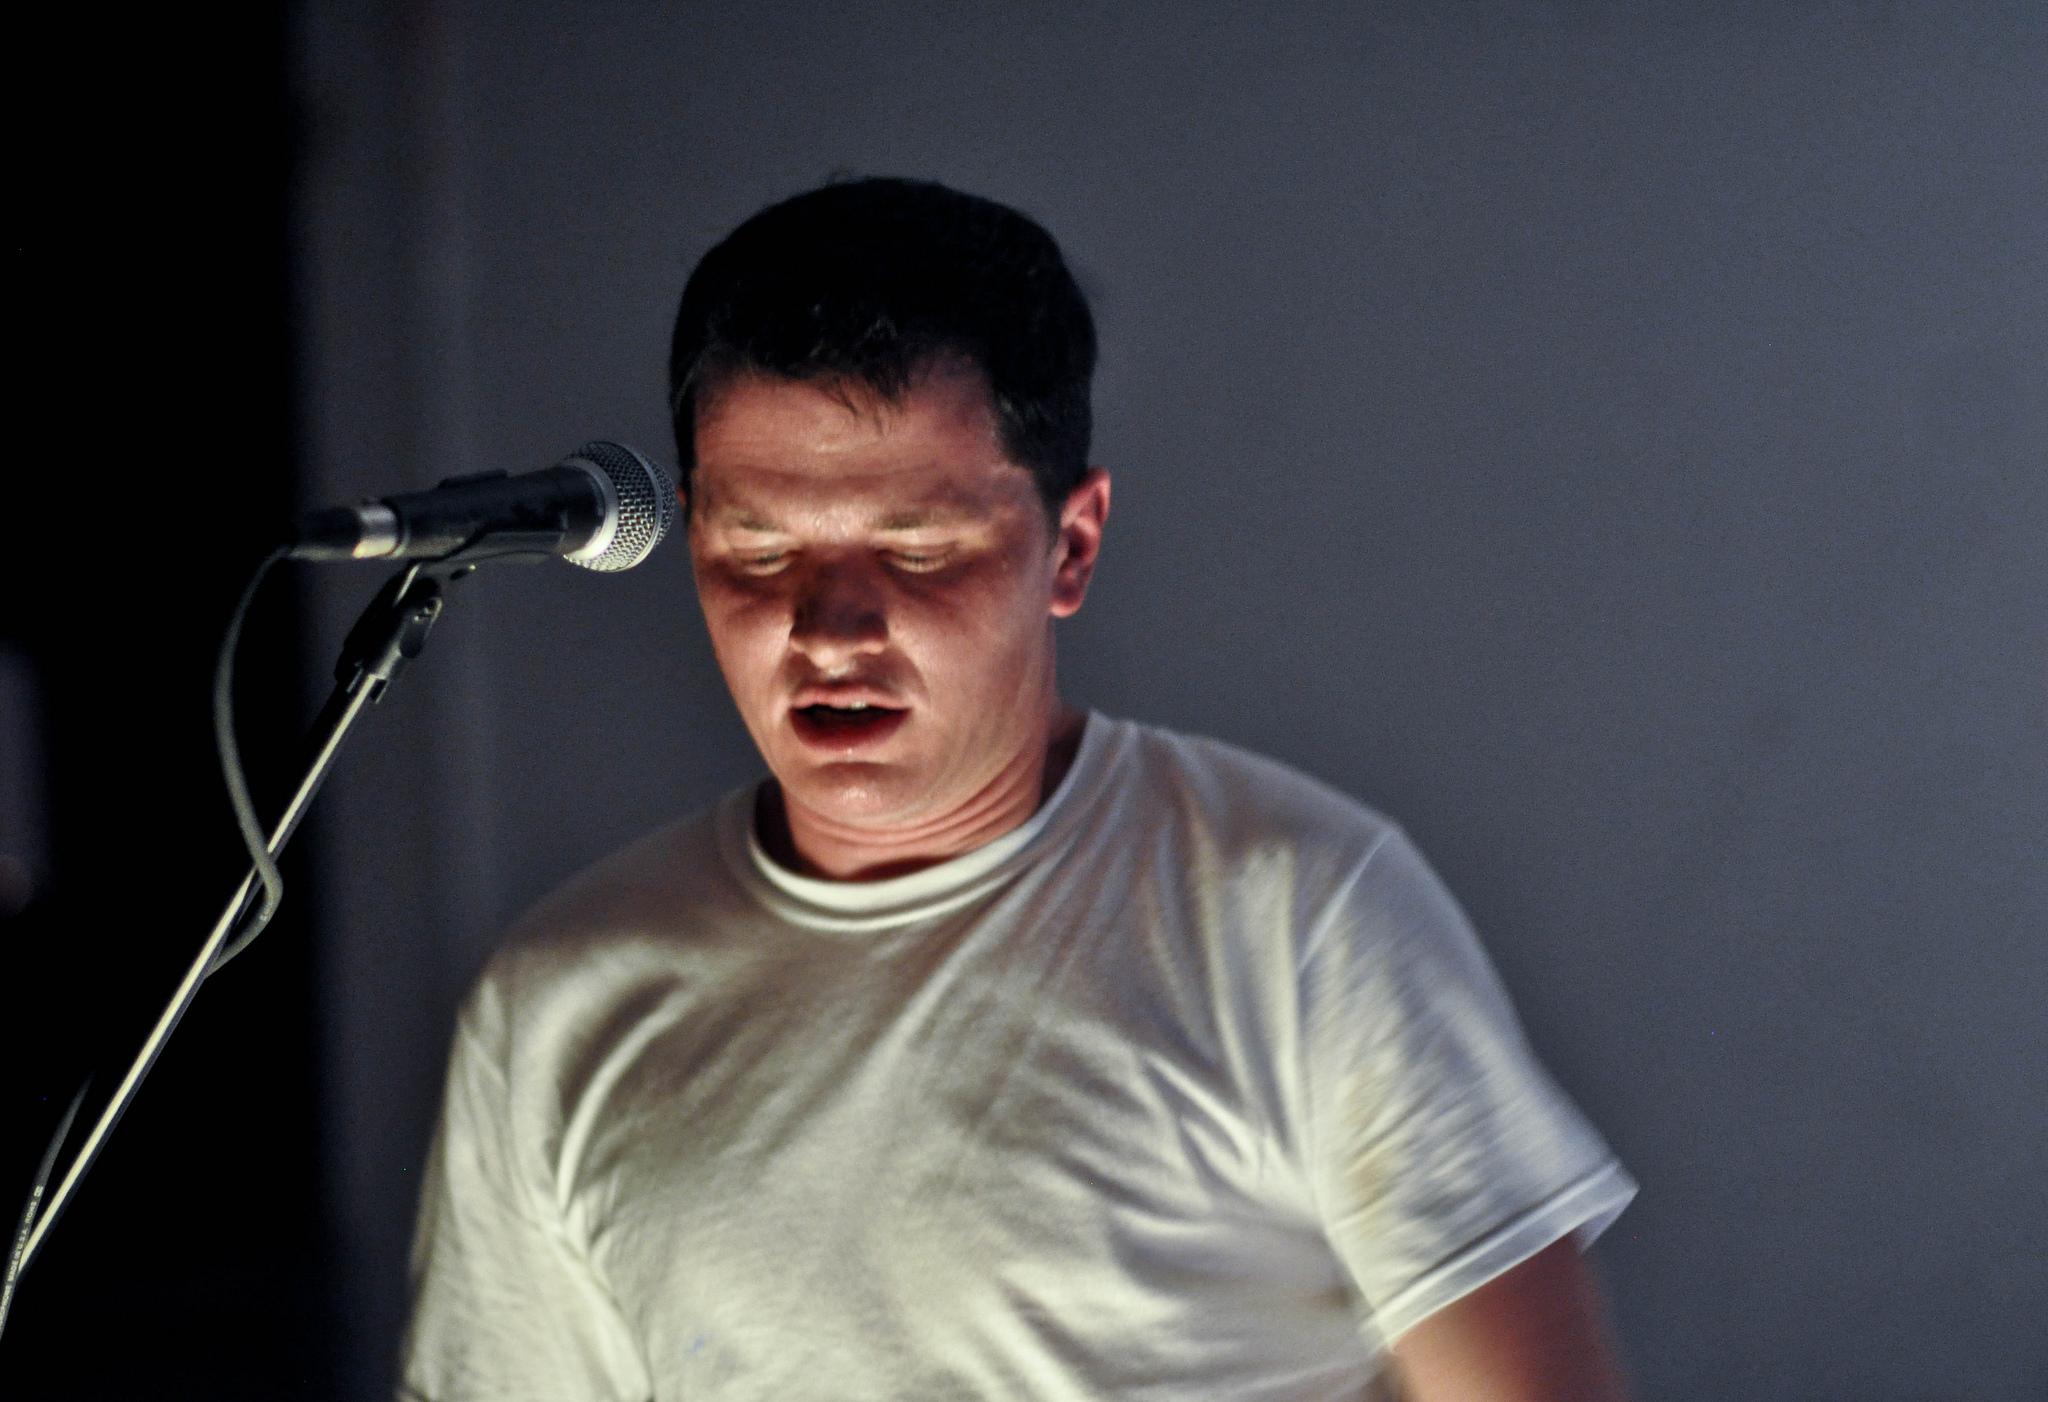 Ed Schrader's Music Beat at Shea Stadium on September 1, 2012